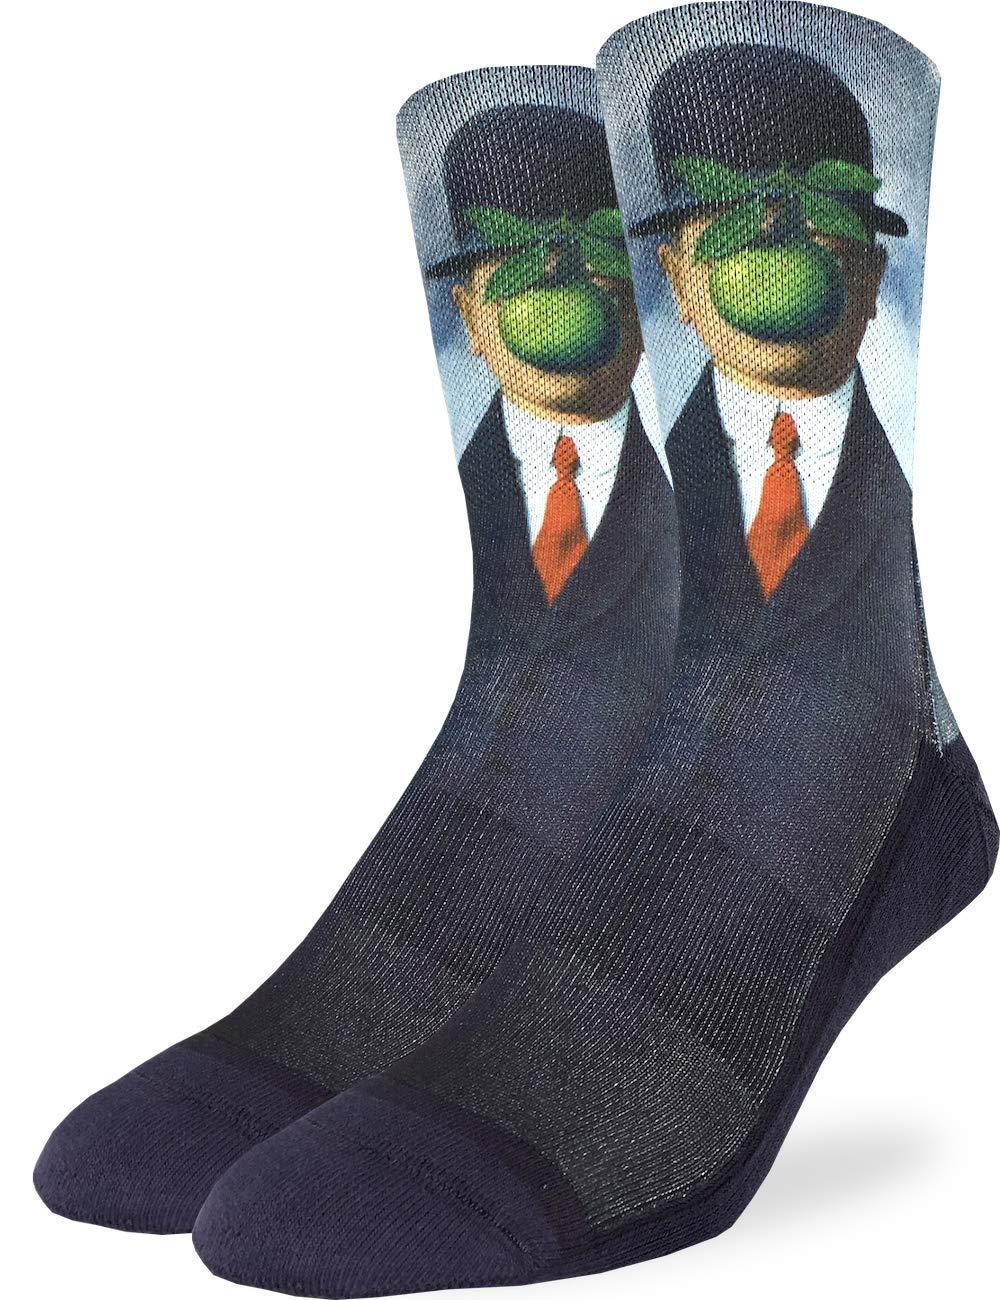 Good Luck Sock Men's The Son of Man Socks - Black, Adult Shoe Size 8-13